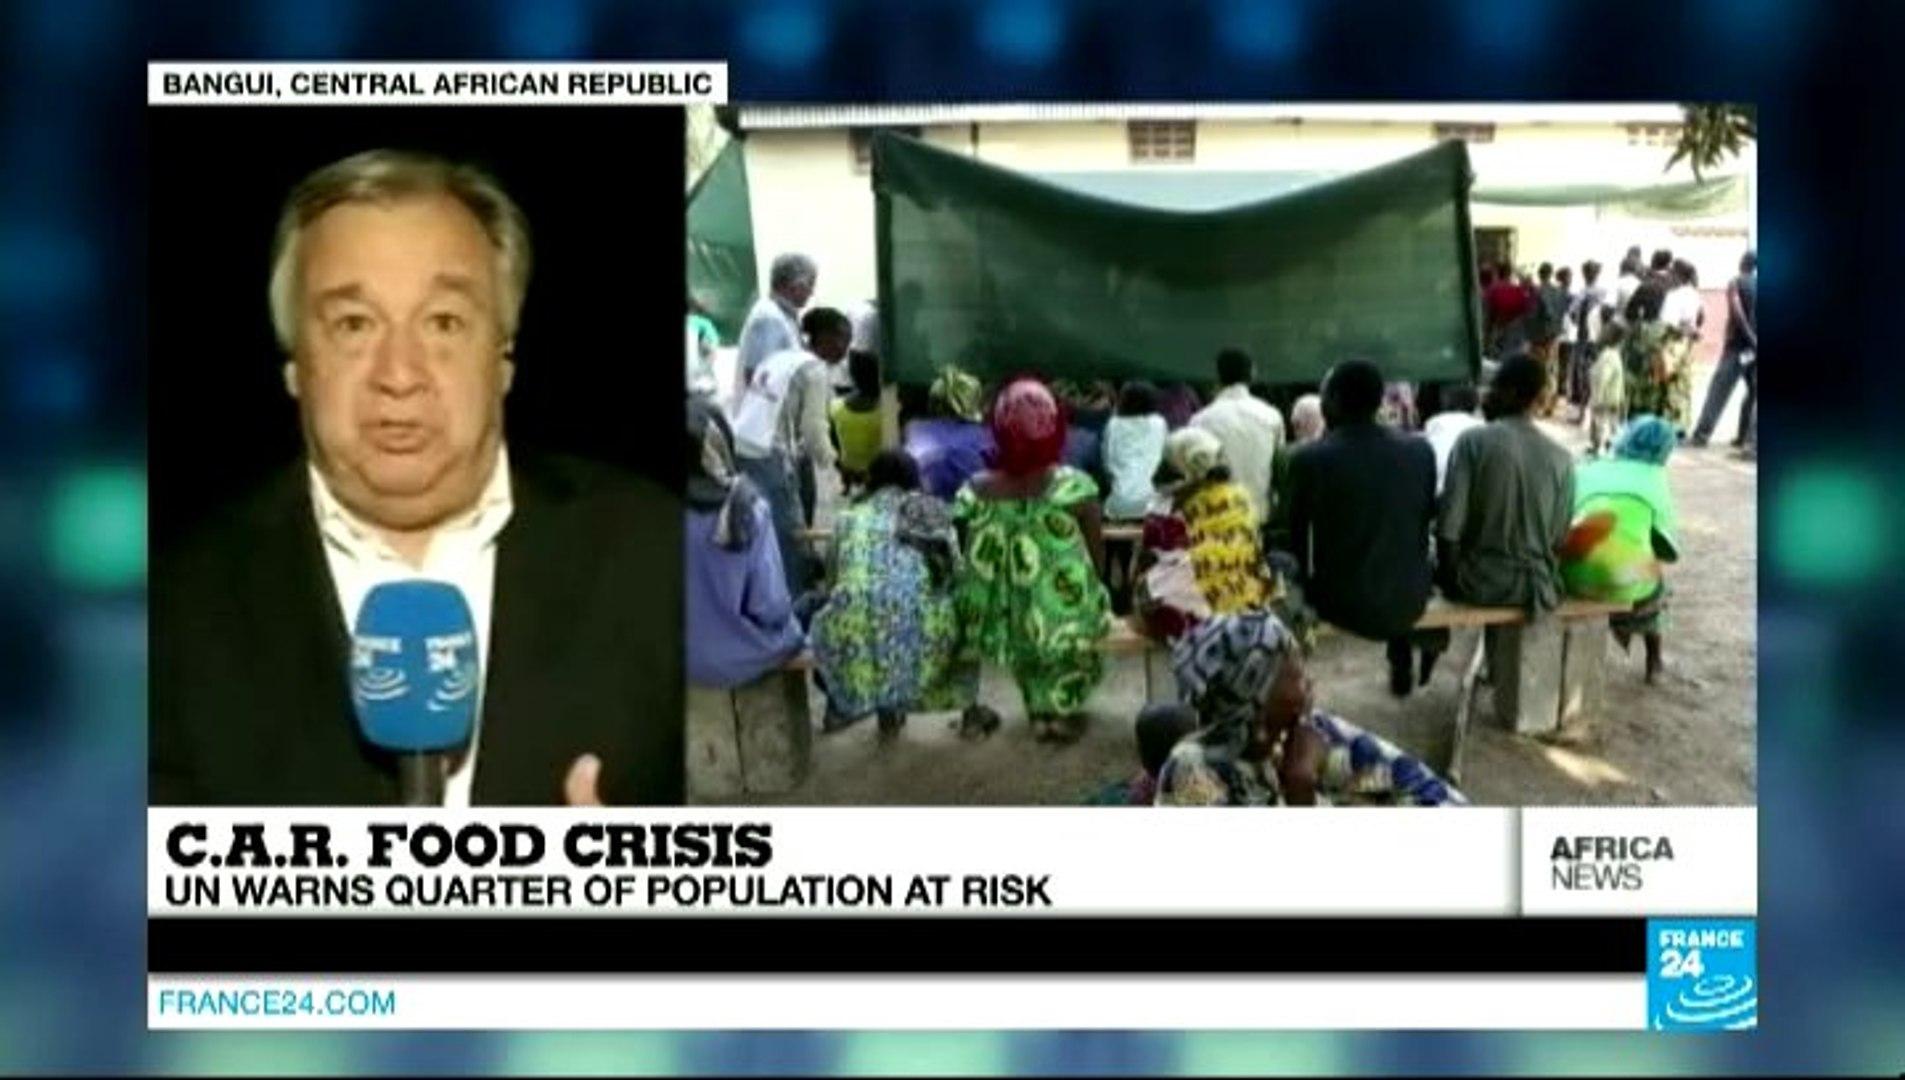 Africa News - Food shortage worsens as Muslim traders flee Central African Republic